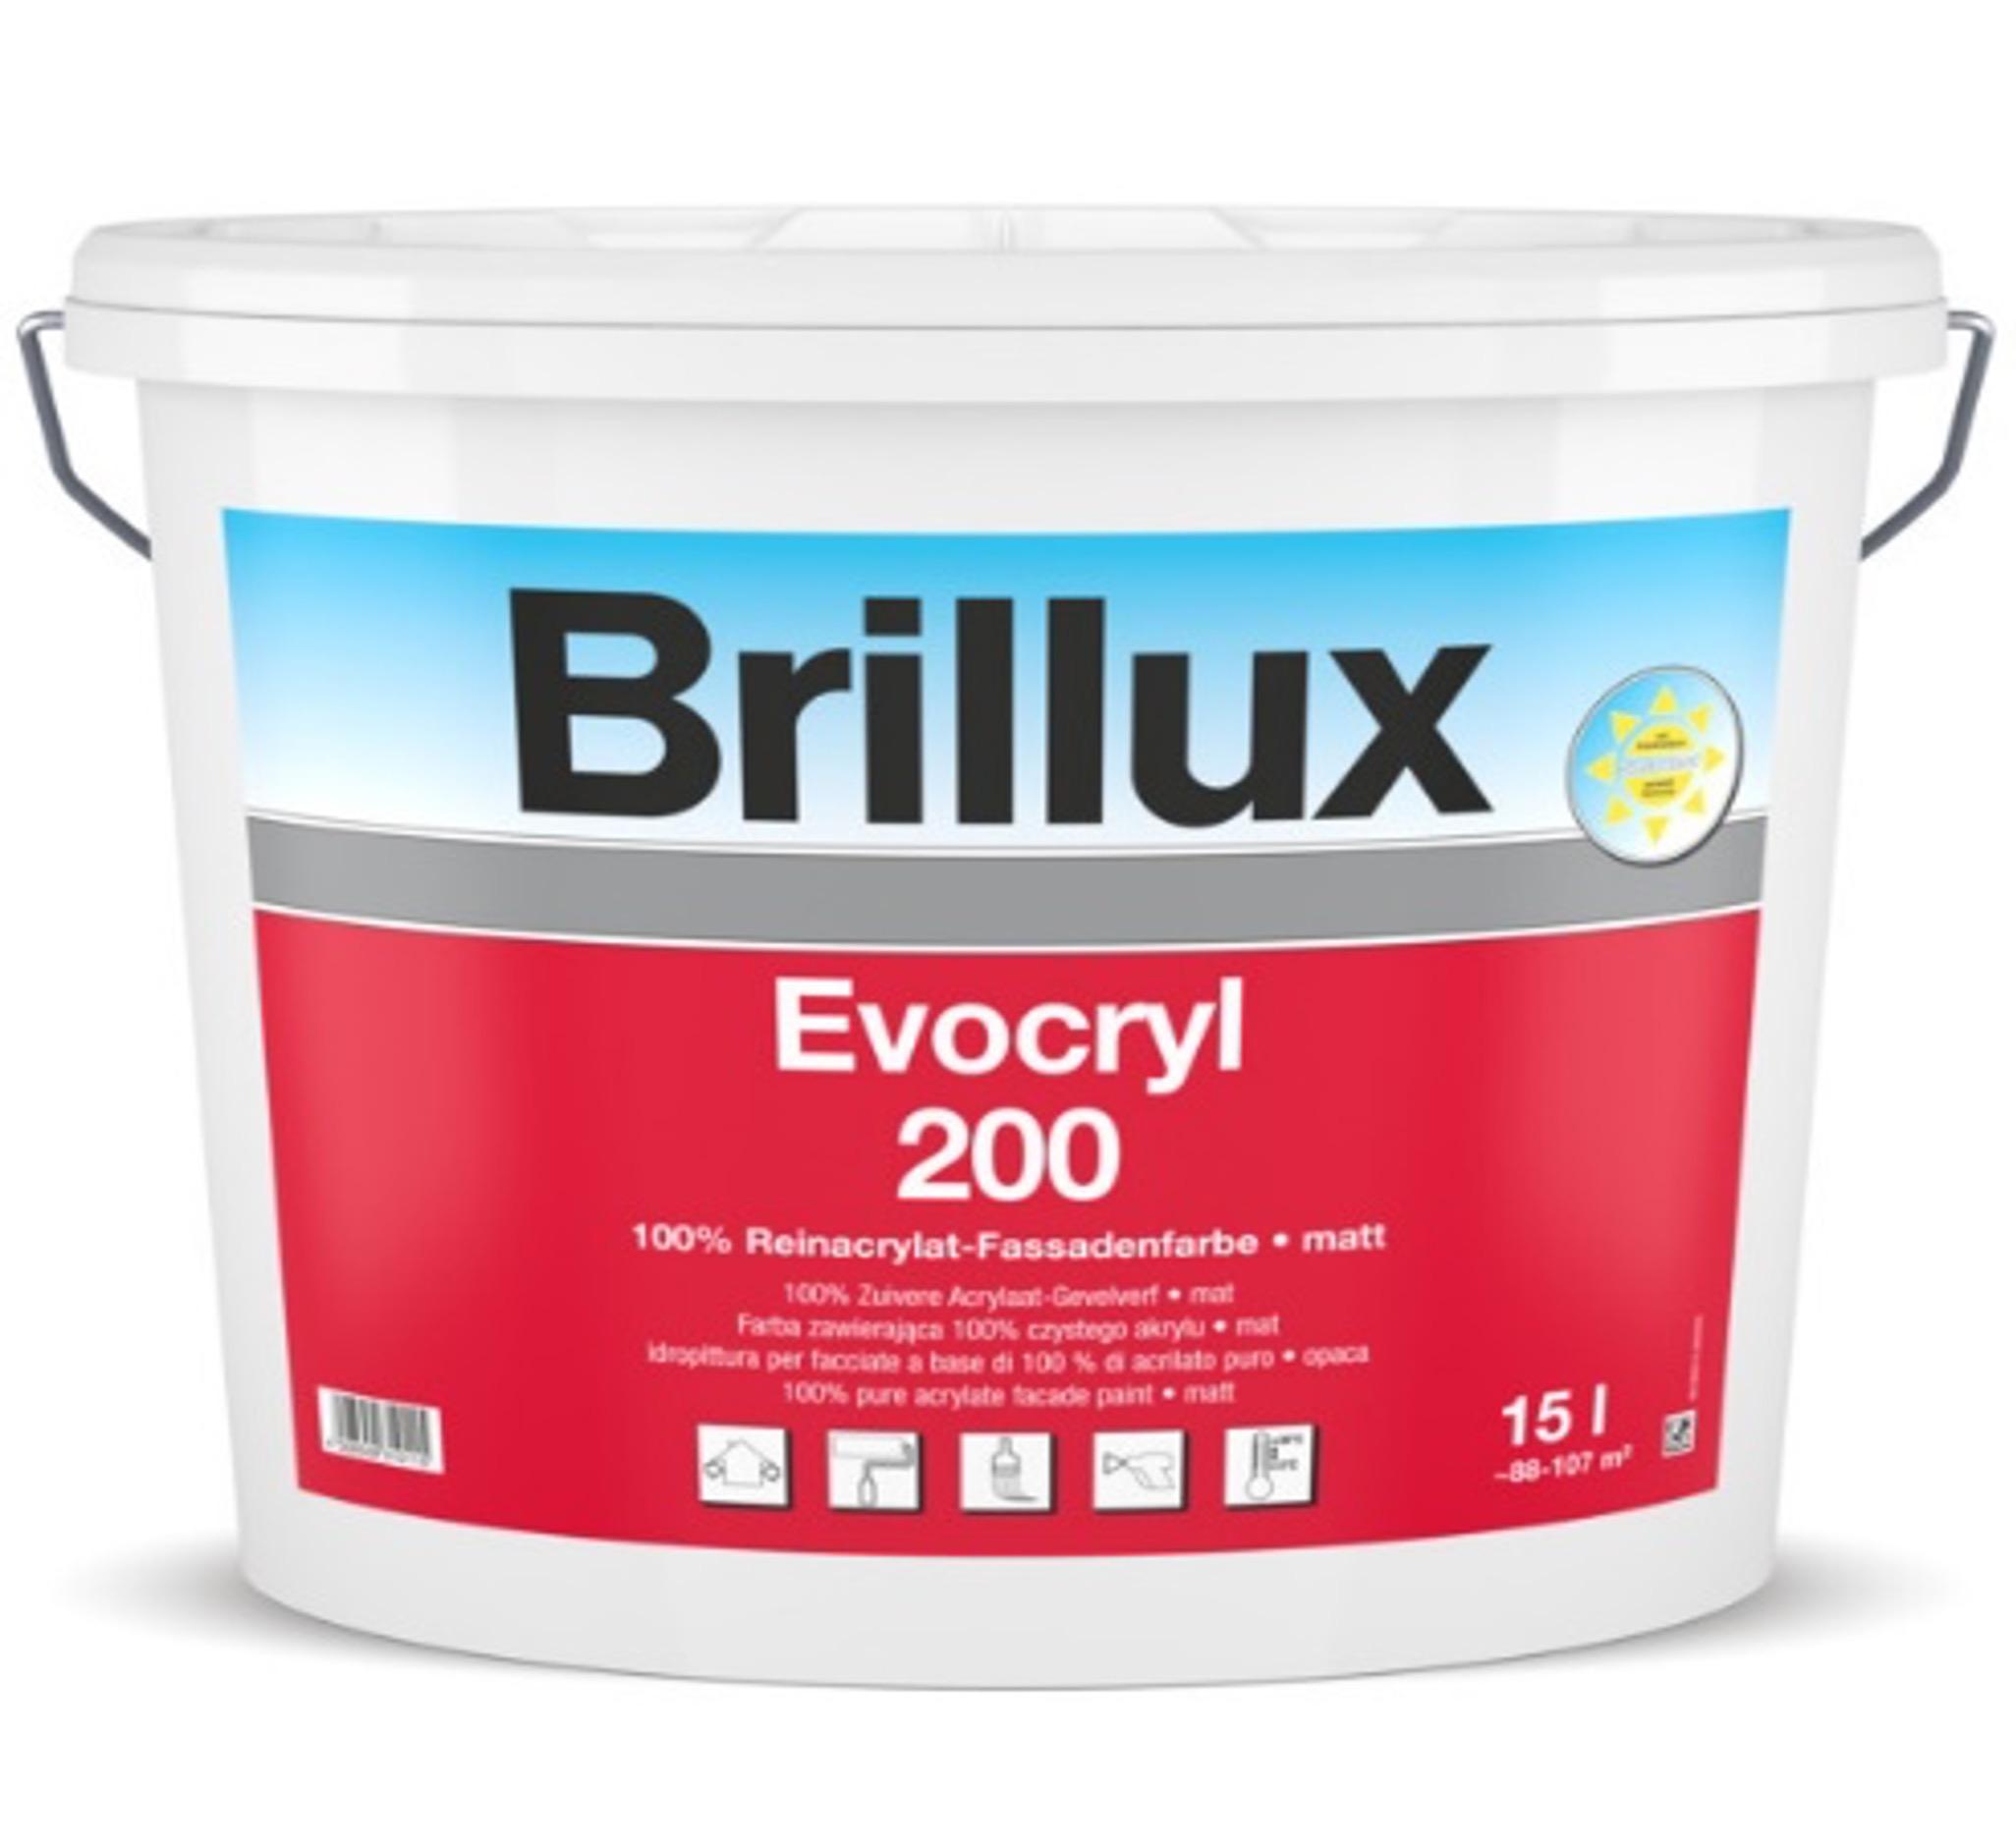 Brillux Evocryl 200 Fassadenfarbe Image